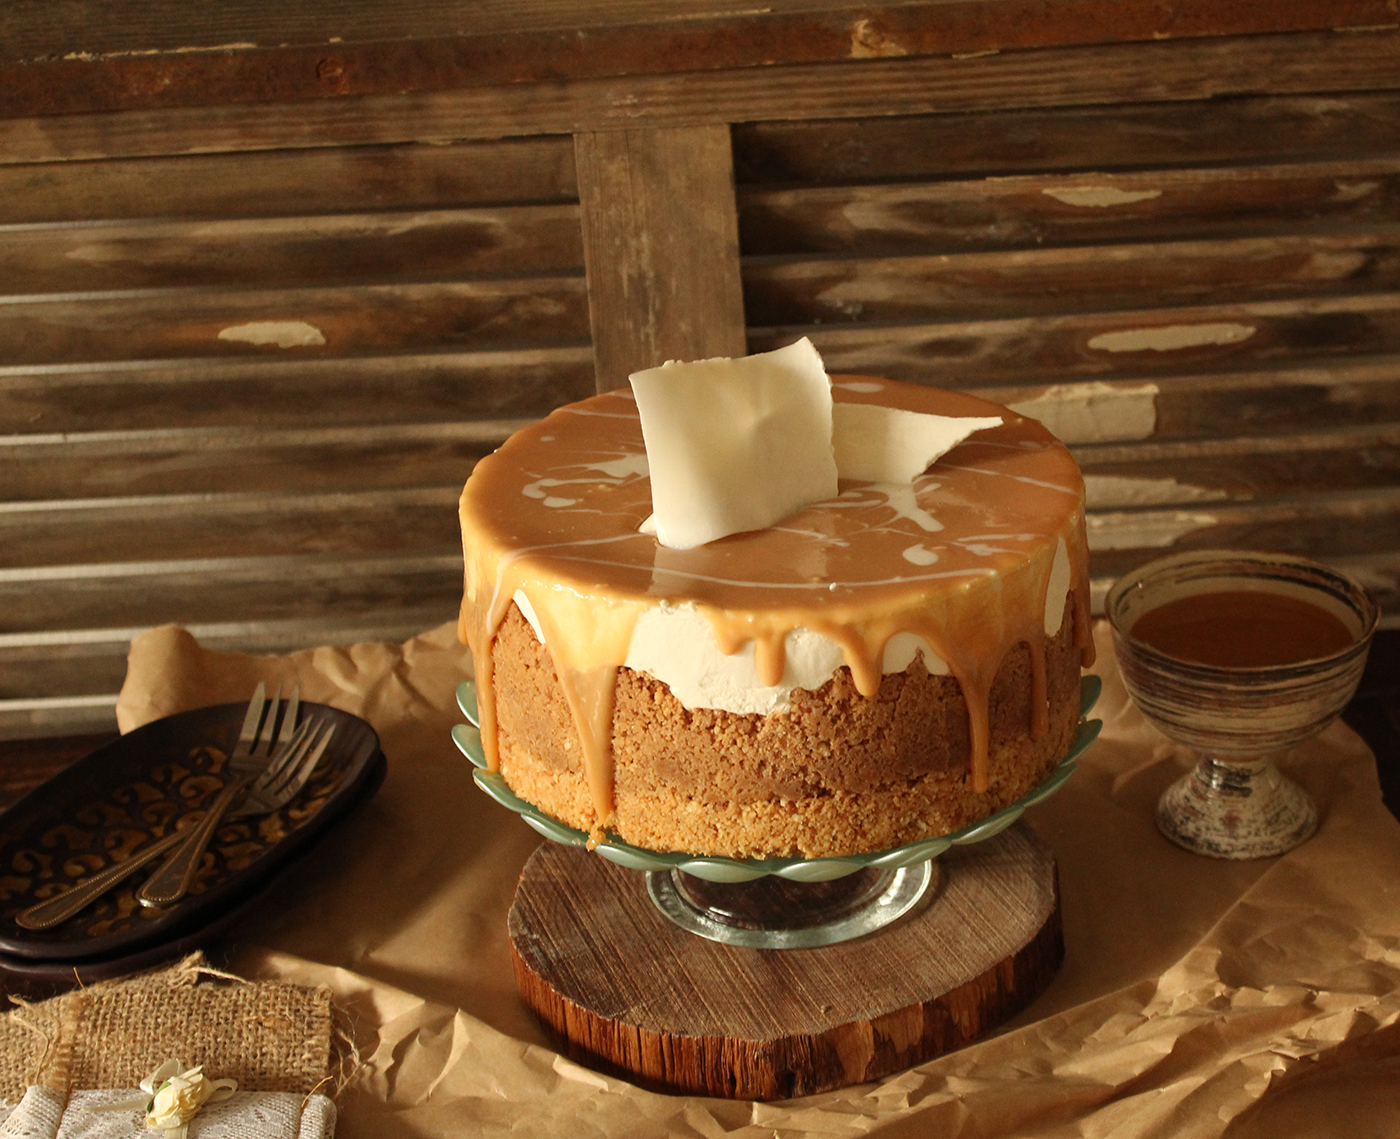 IMG 8309 - עוגת גבינה בציפוי ריבת חלב